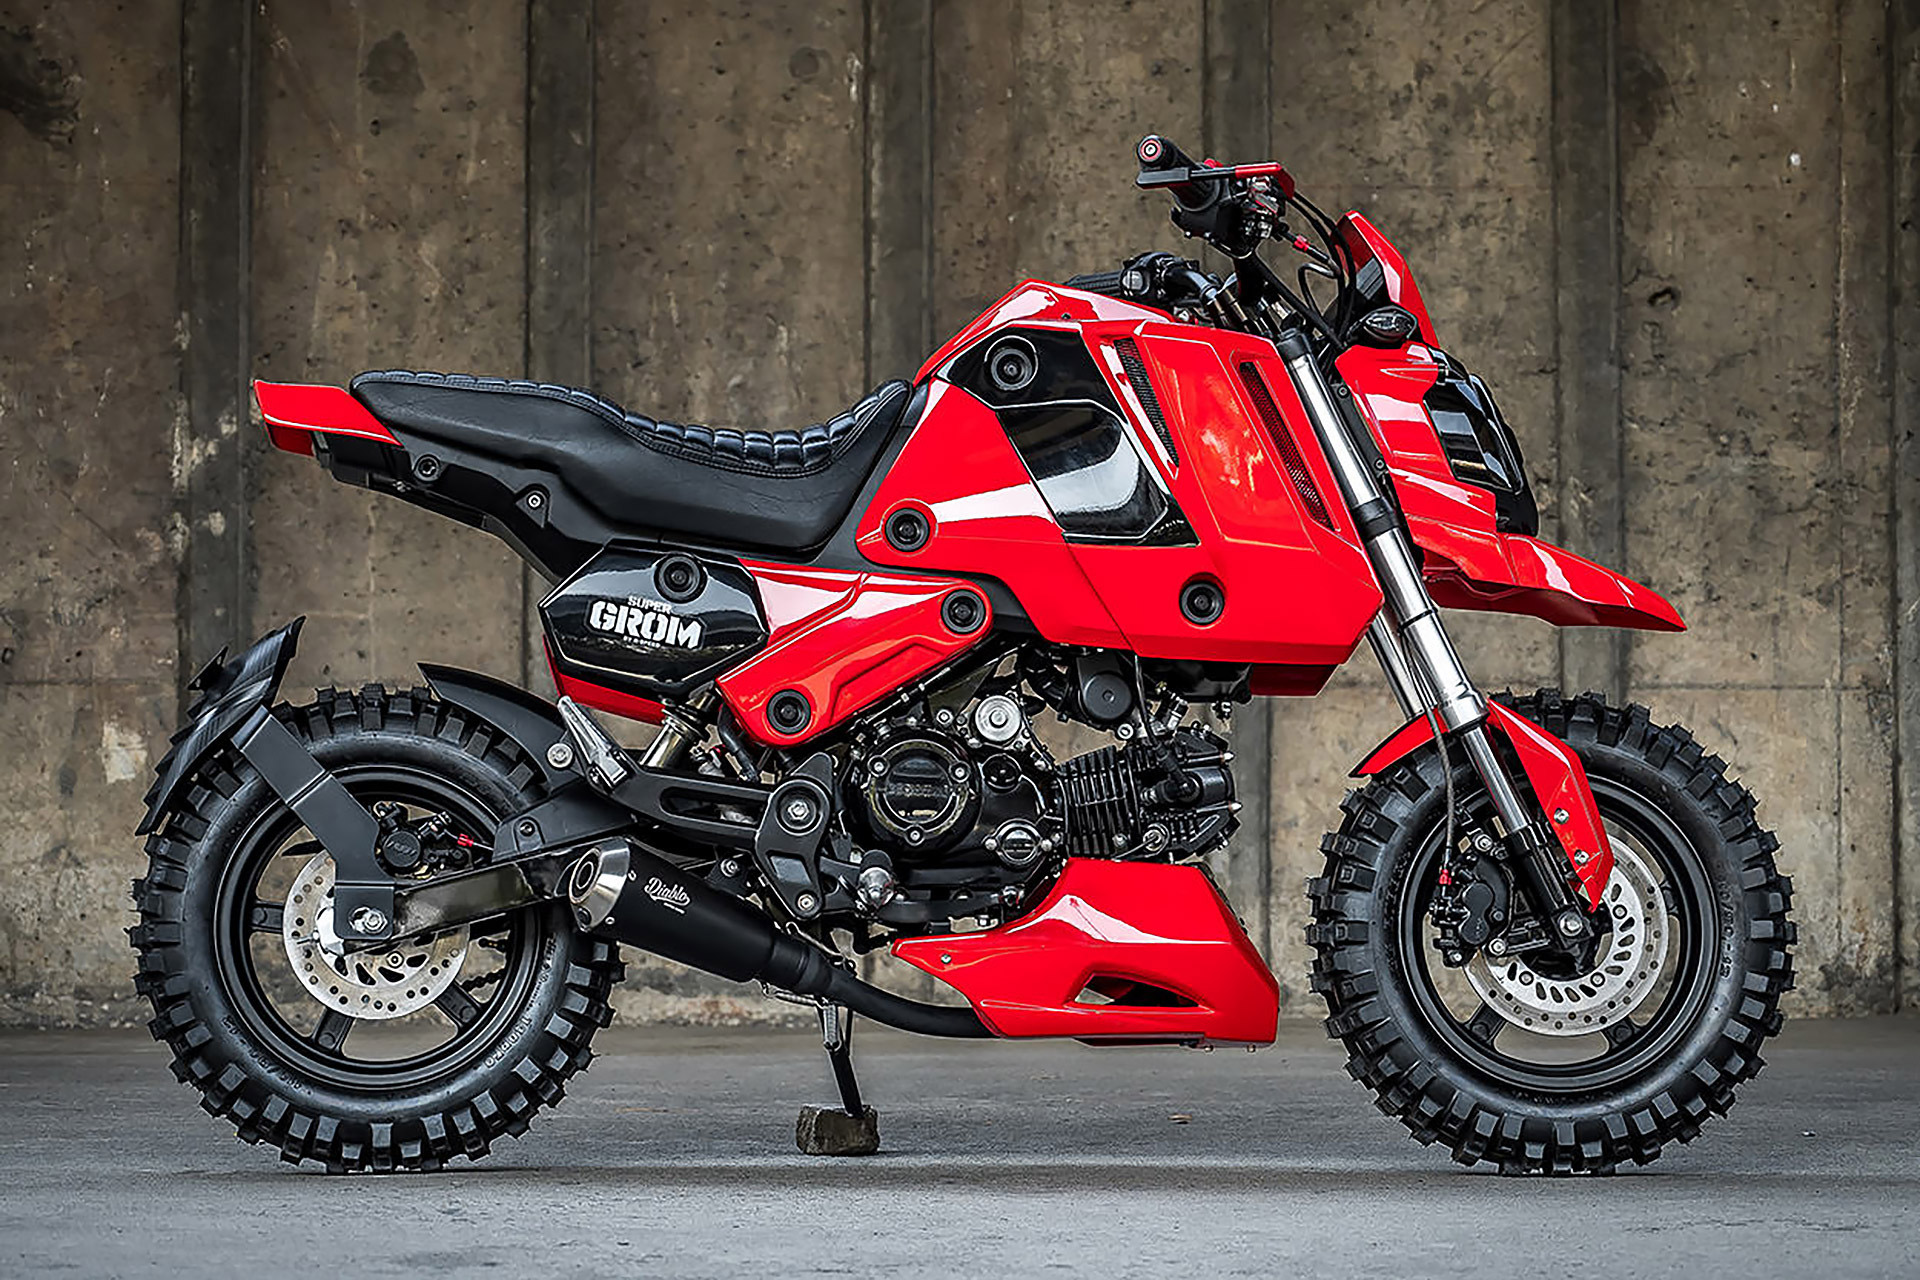 K-Speed Super Grom Motorcycle Kit